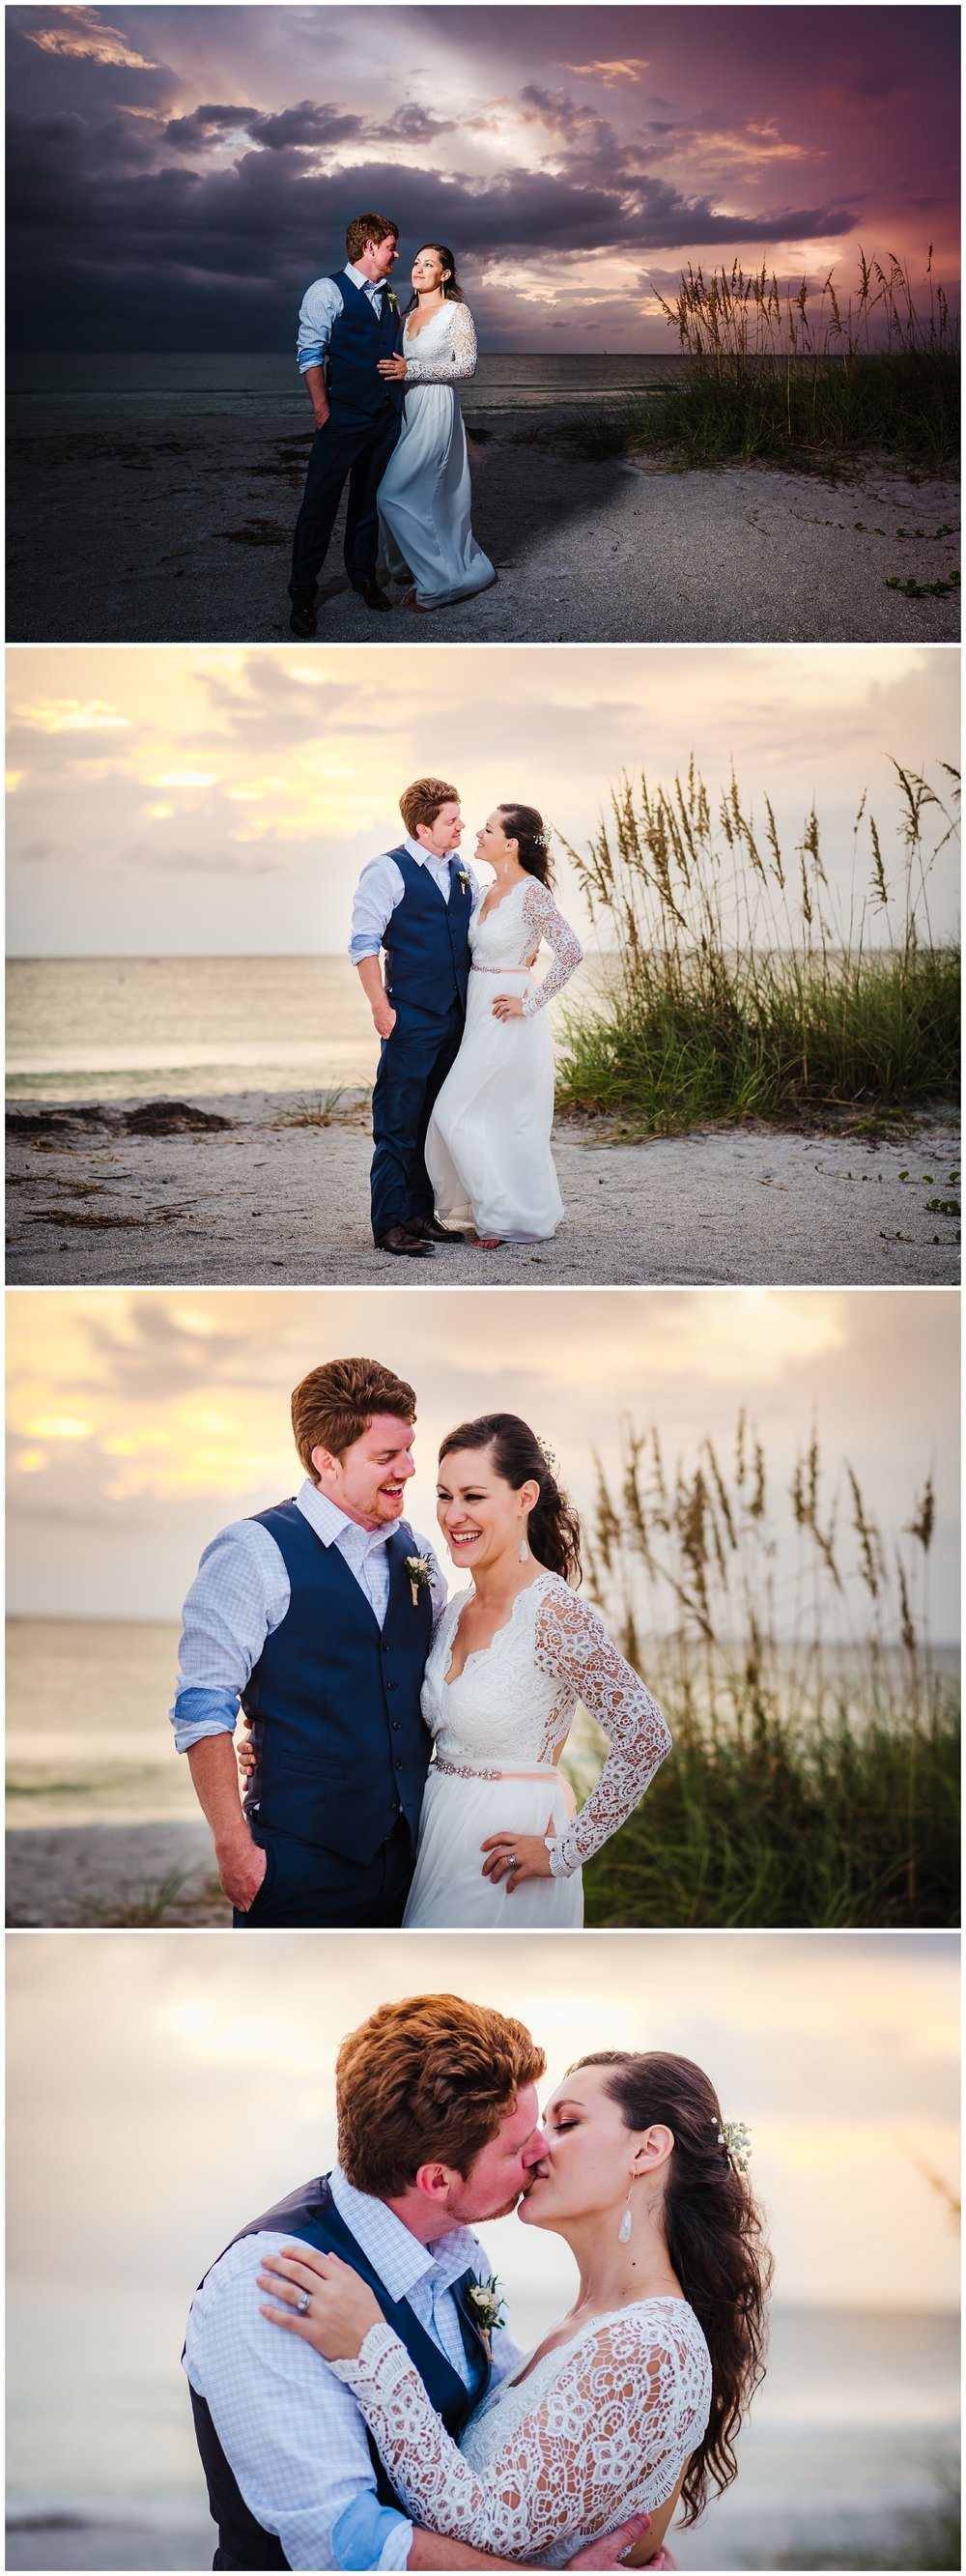 st-pete-wedding-photographer-postcard-inn-sleeve-dress-rain-sunset_0207.jpg